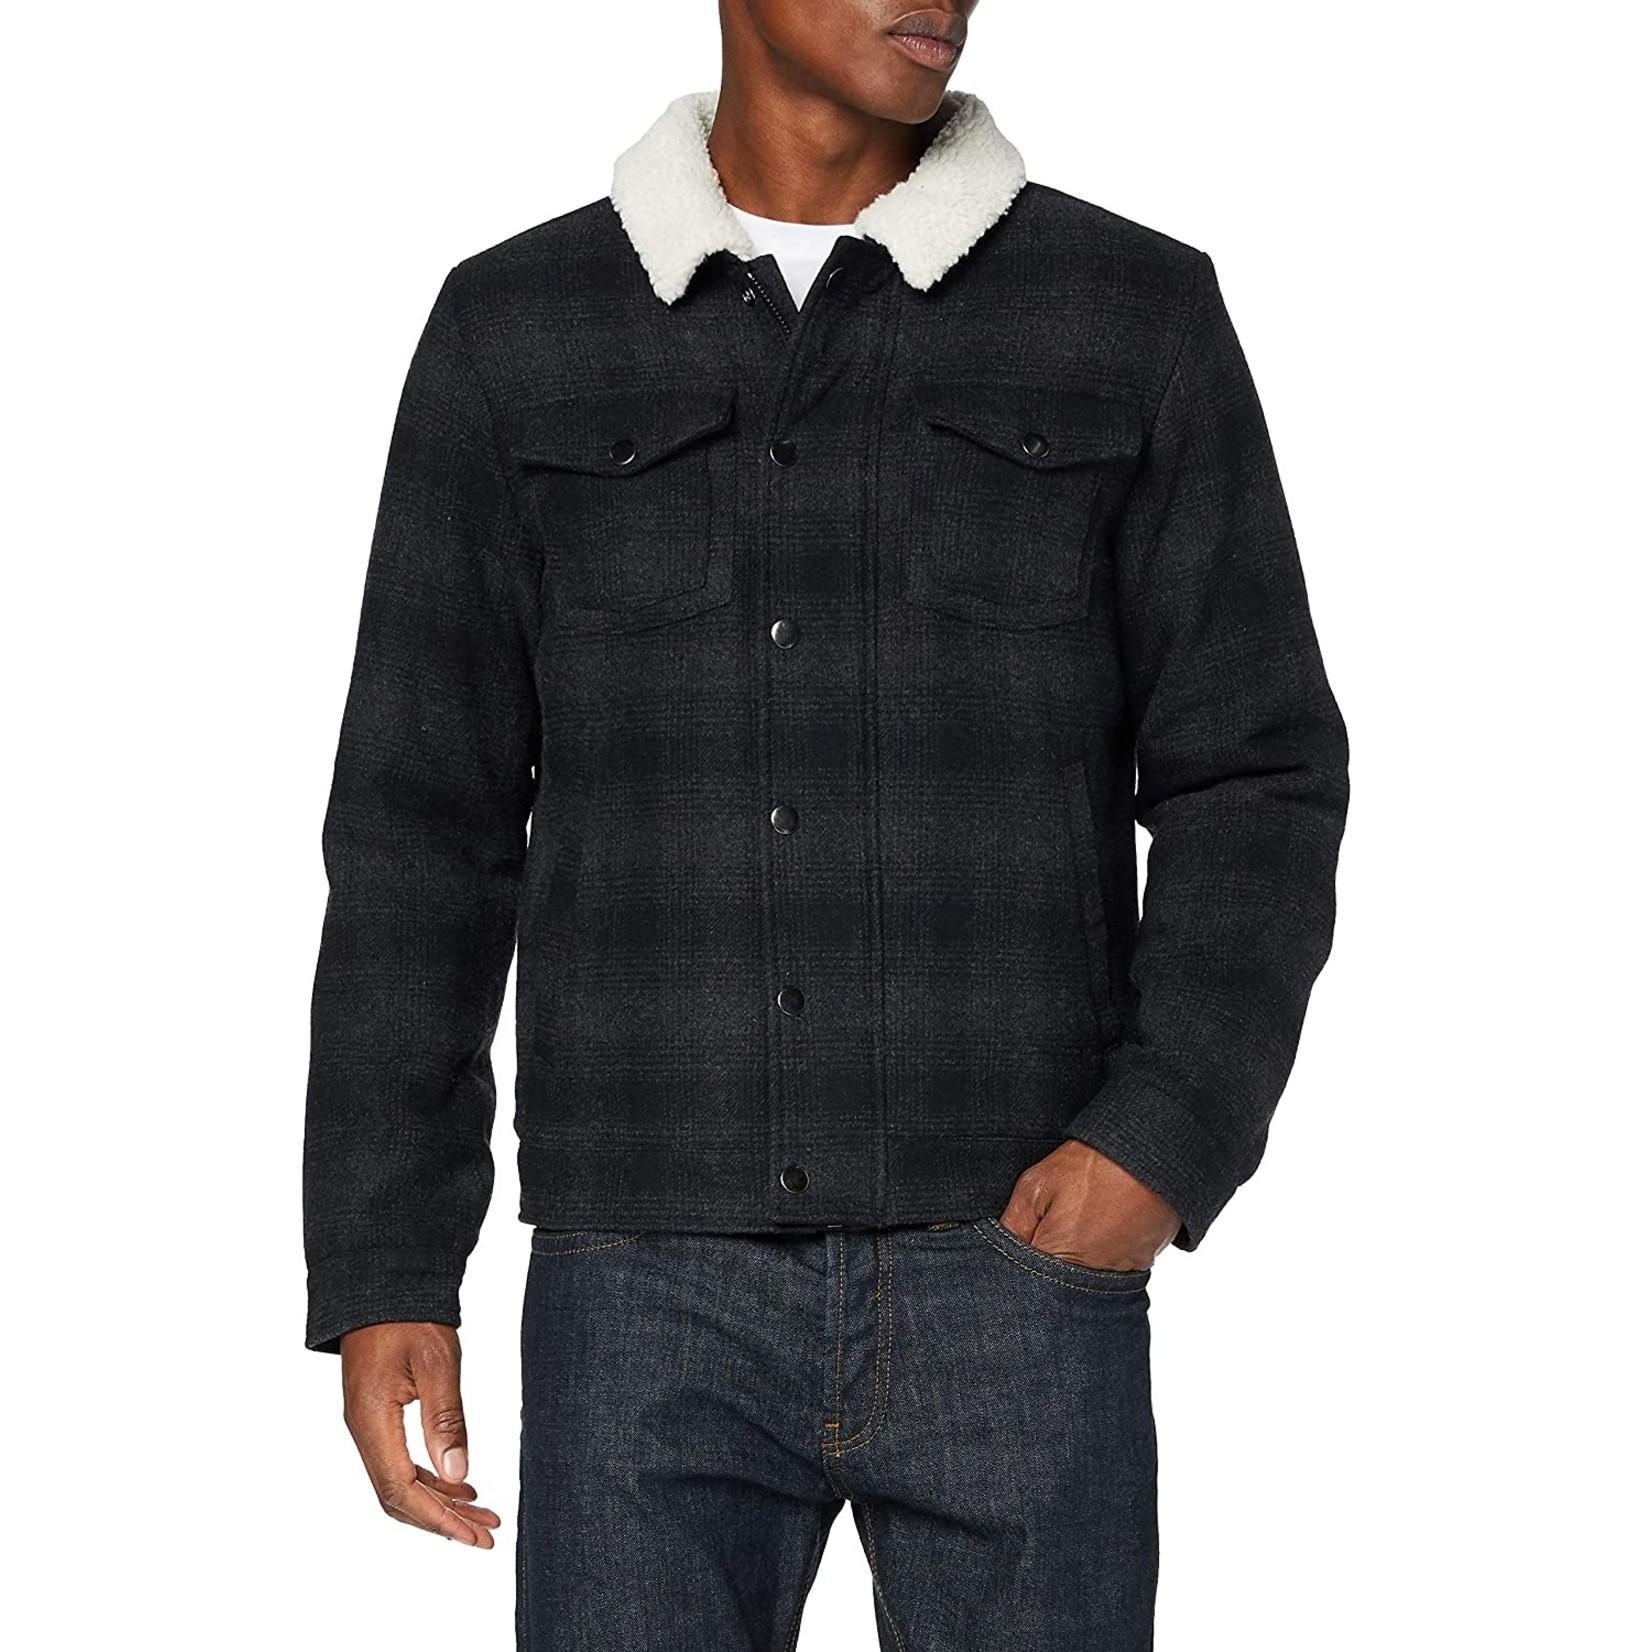 Blend Blend 20711066 Plaid Wool Jacket - Dark Navy